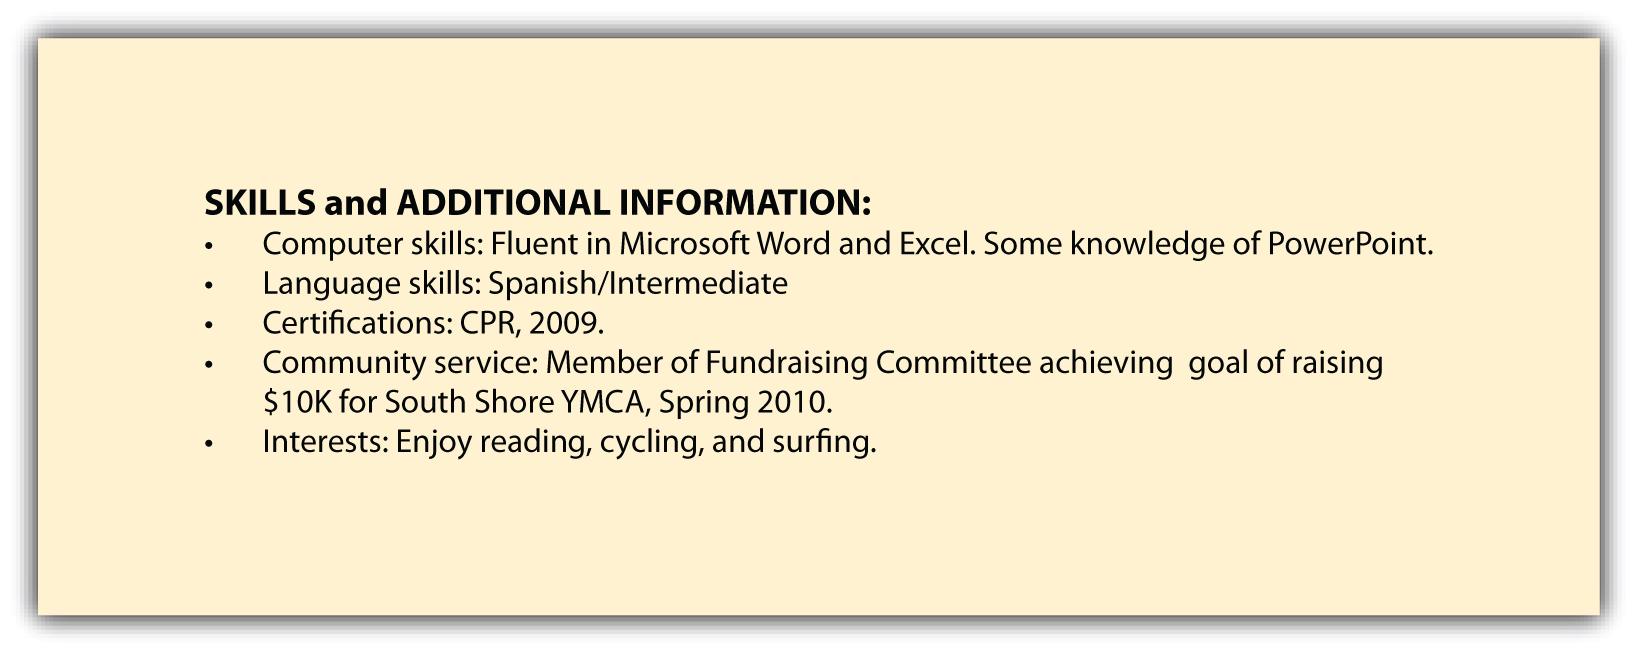 548665: Skills Section Of Resume Example U2013 Example Skills .